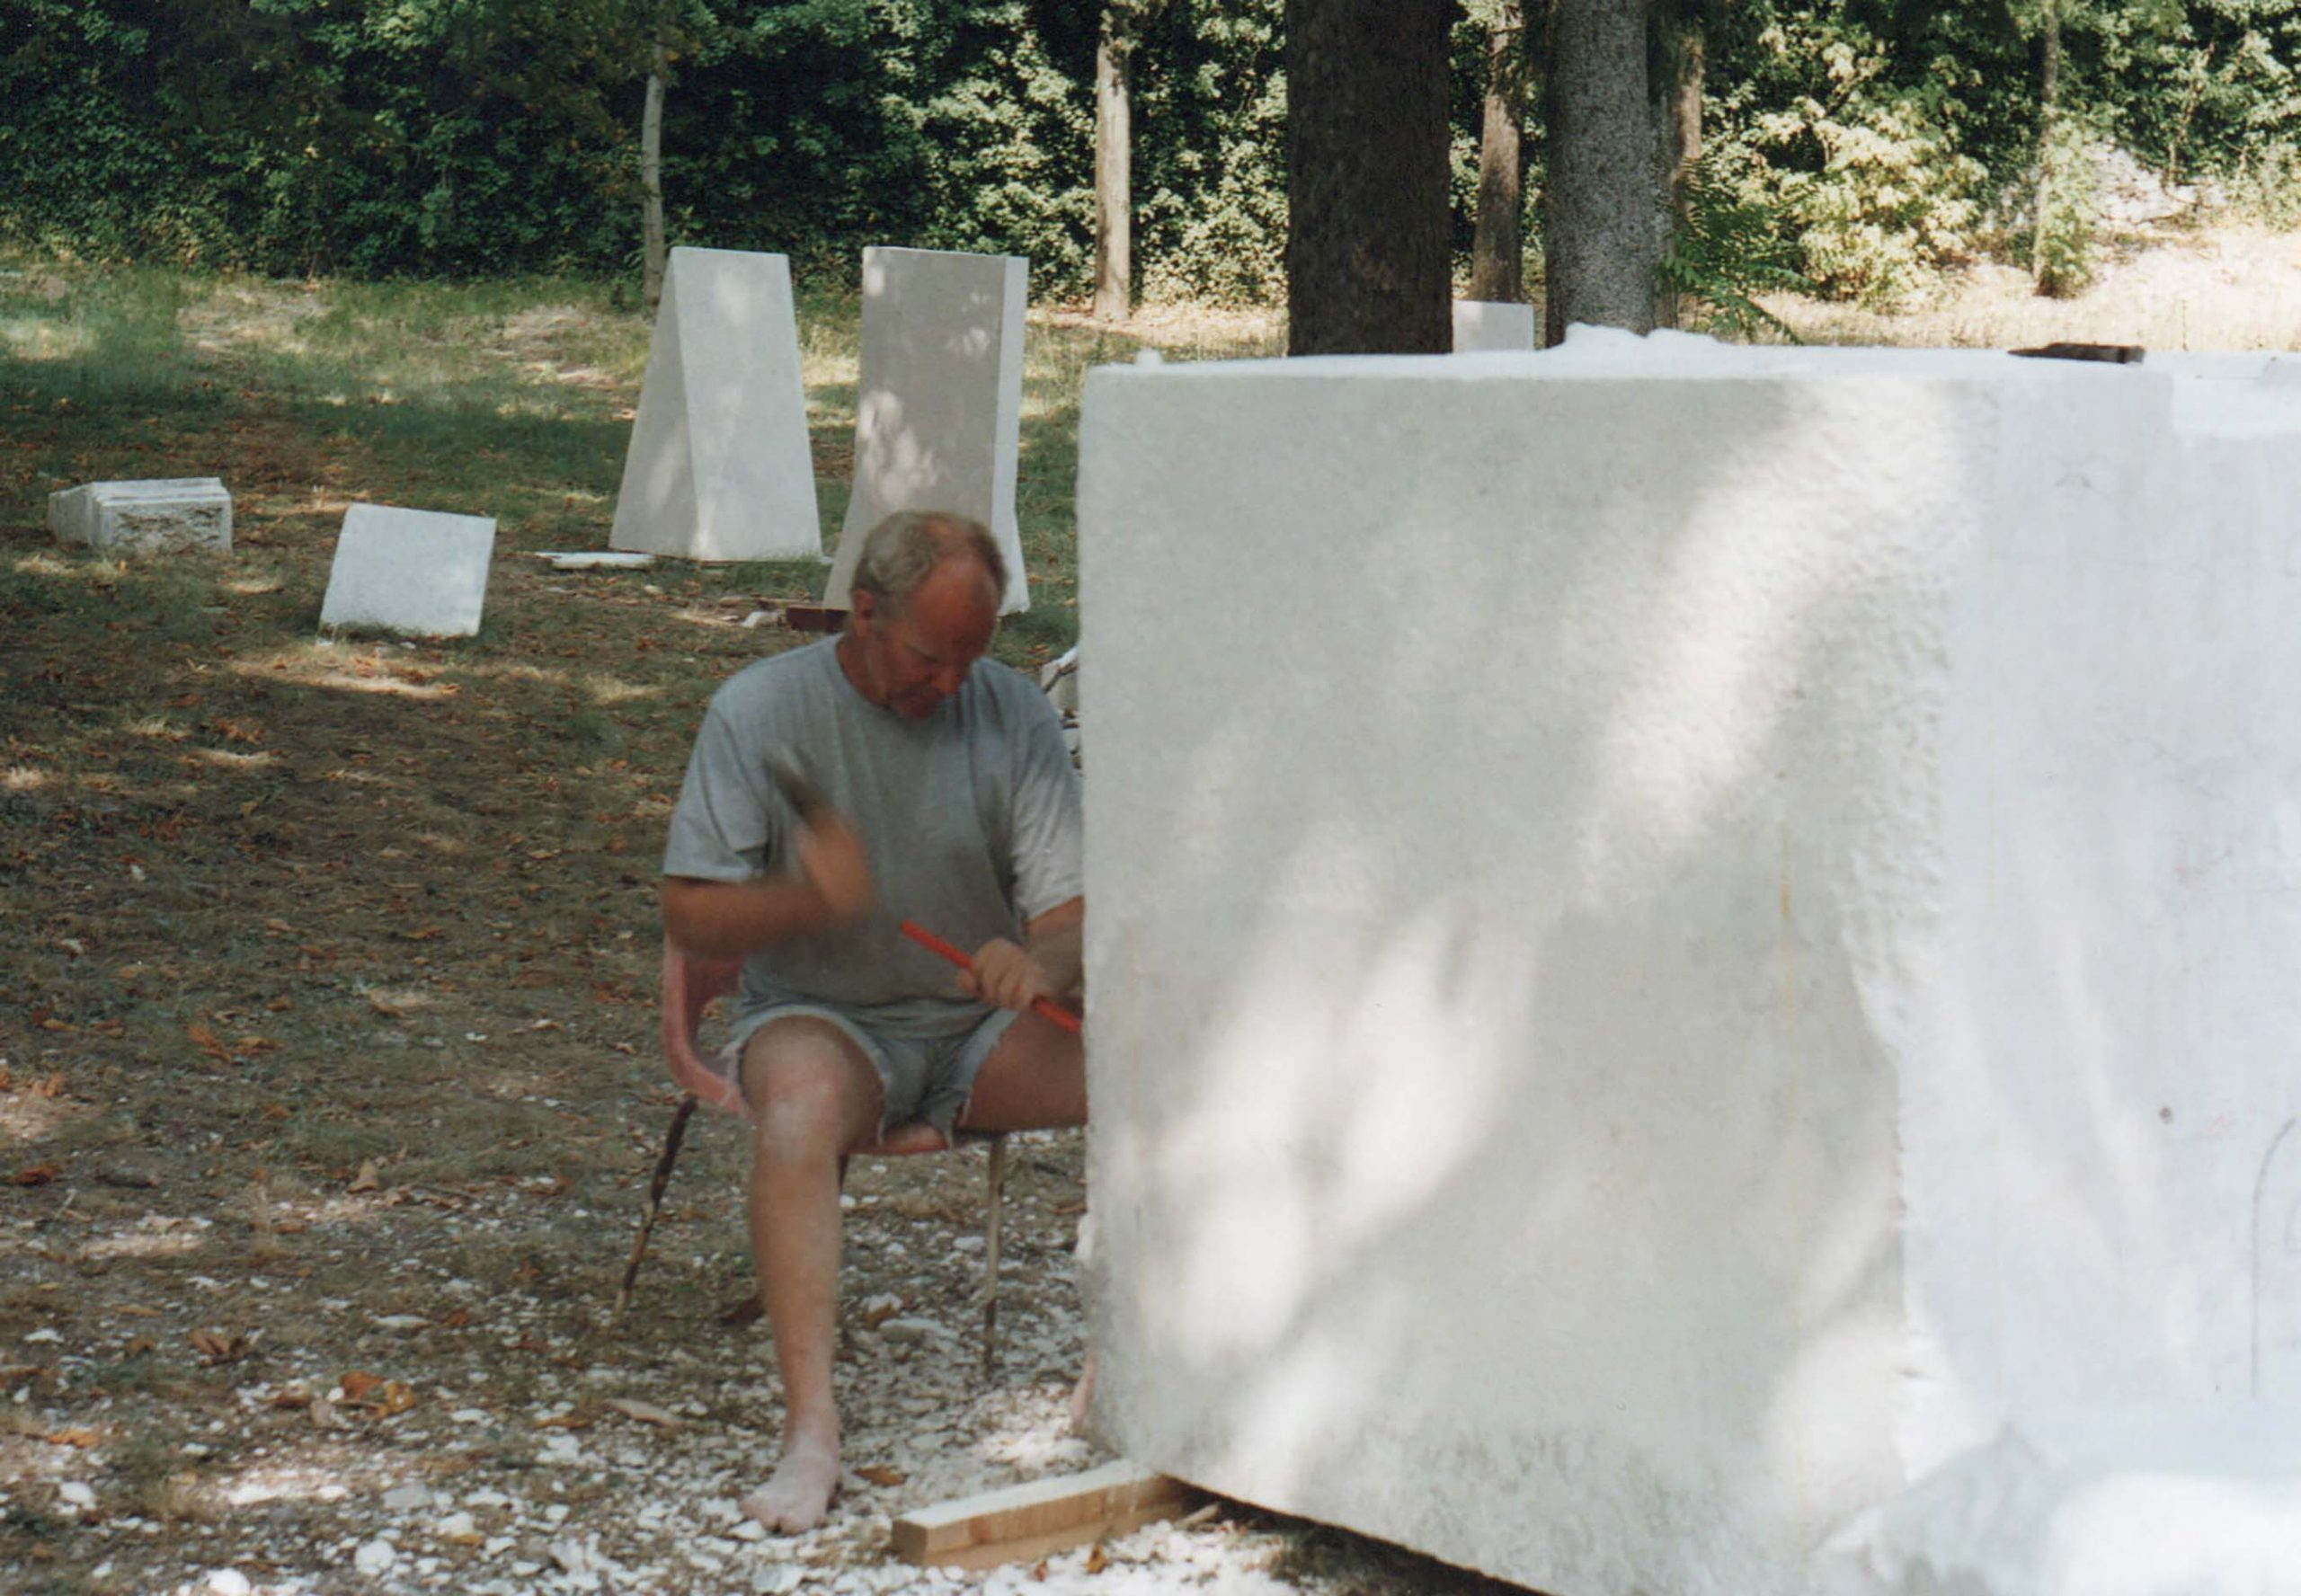 Joost Barbiers, Kuća Svjetla, 2001.